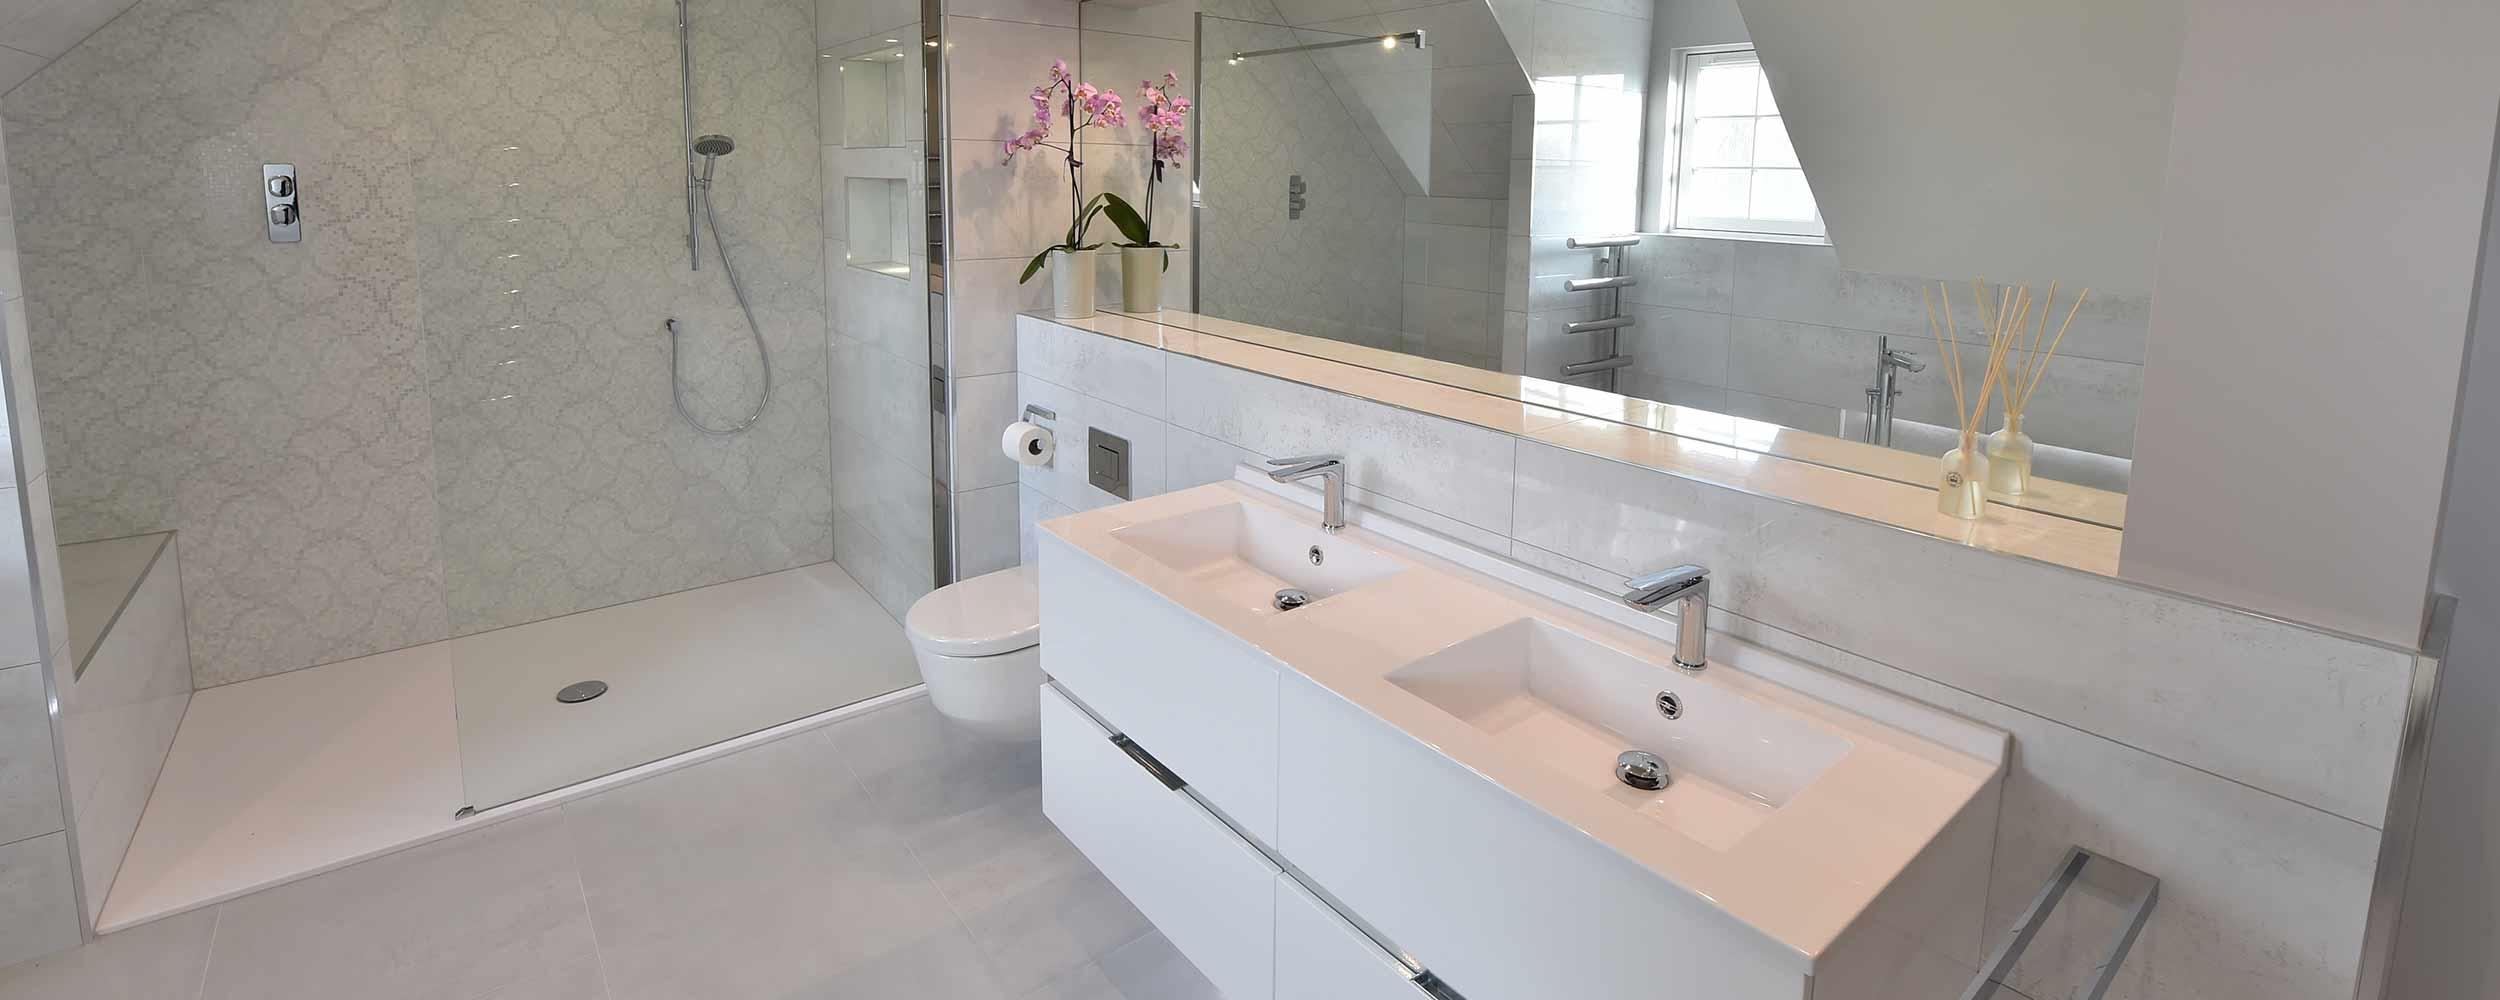 Bathrooms Edinburgh | Bathroom Showroom Edinburgh ...